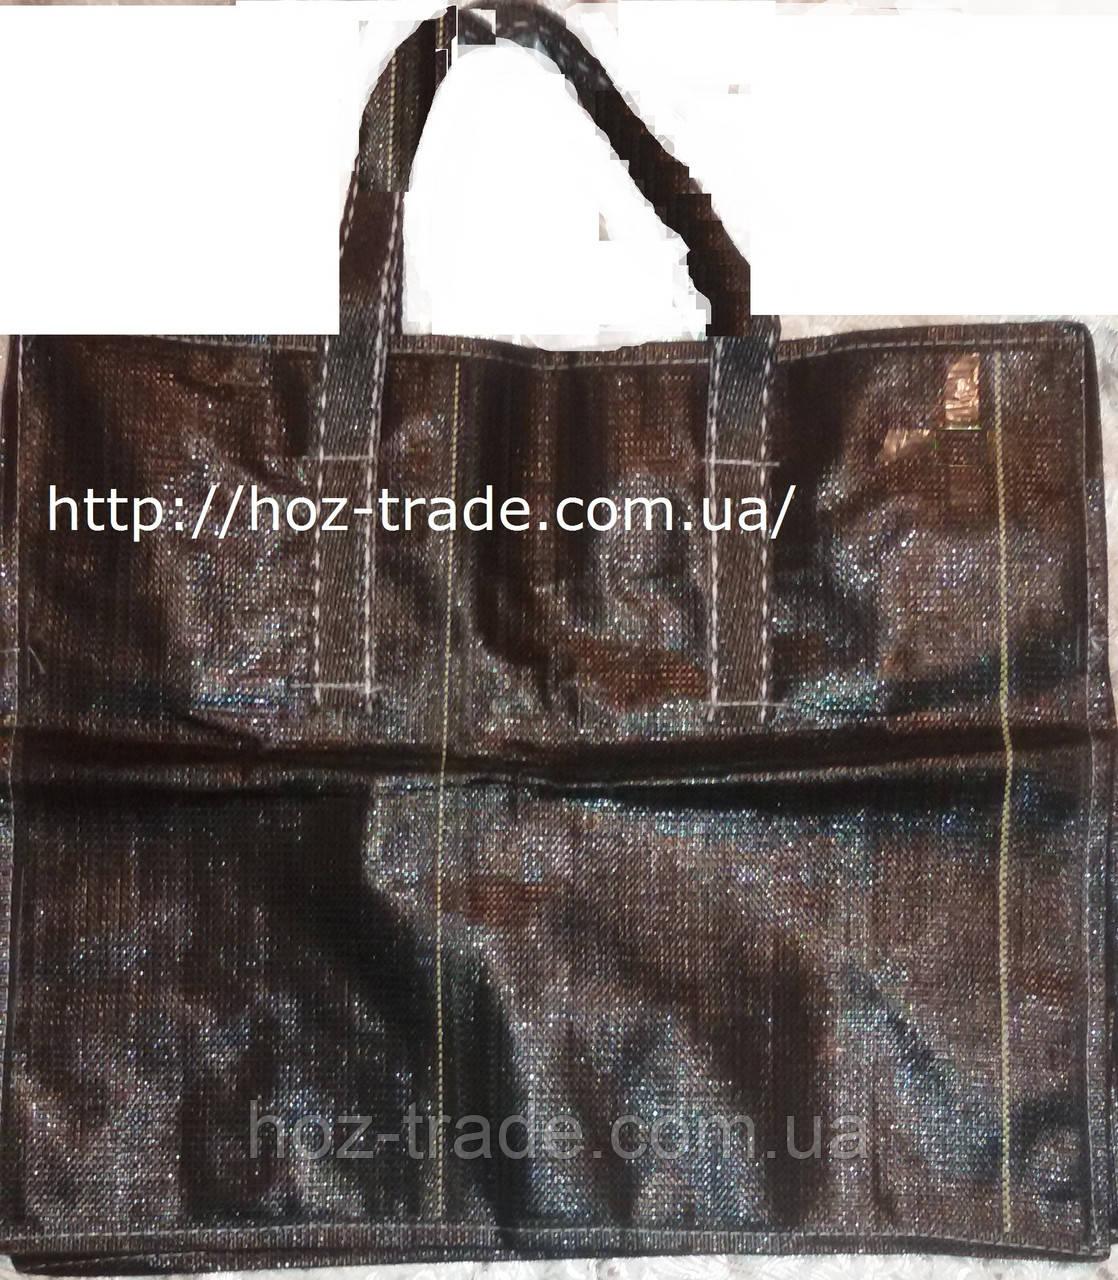 0a83e916ffeb Сумка хозяйственная прочная №2 (40х45х20см): продажа, цена в ...